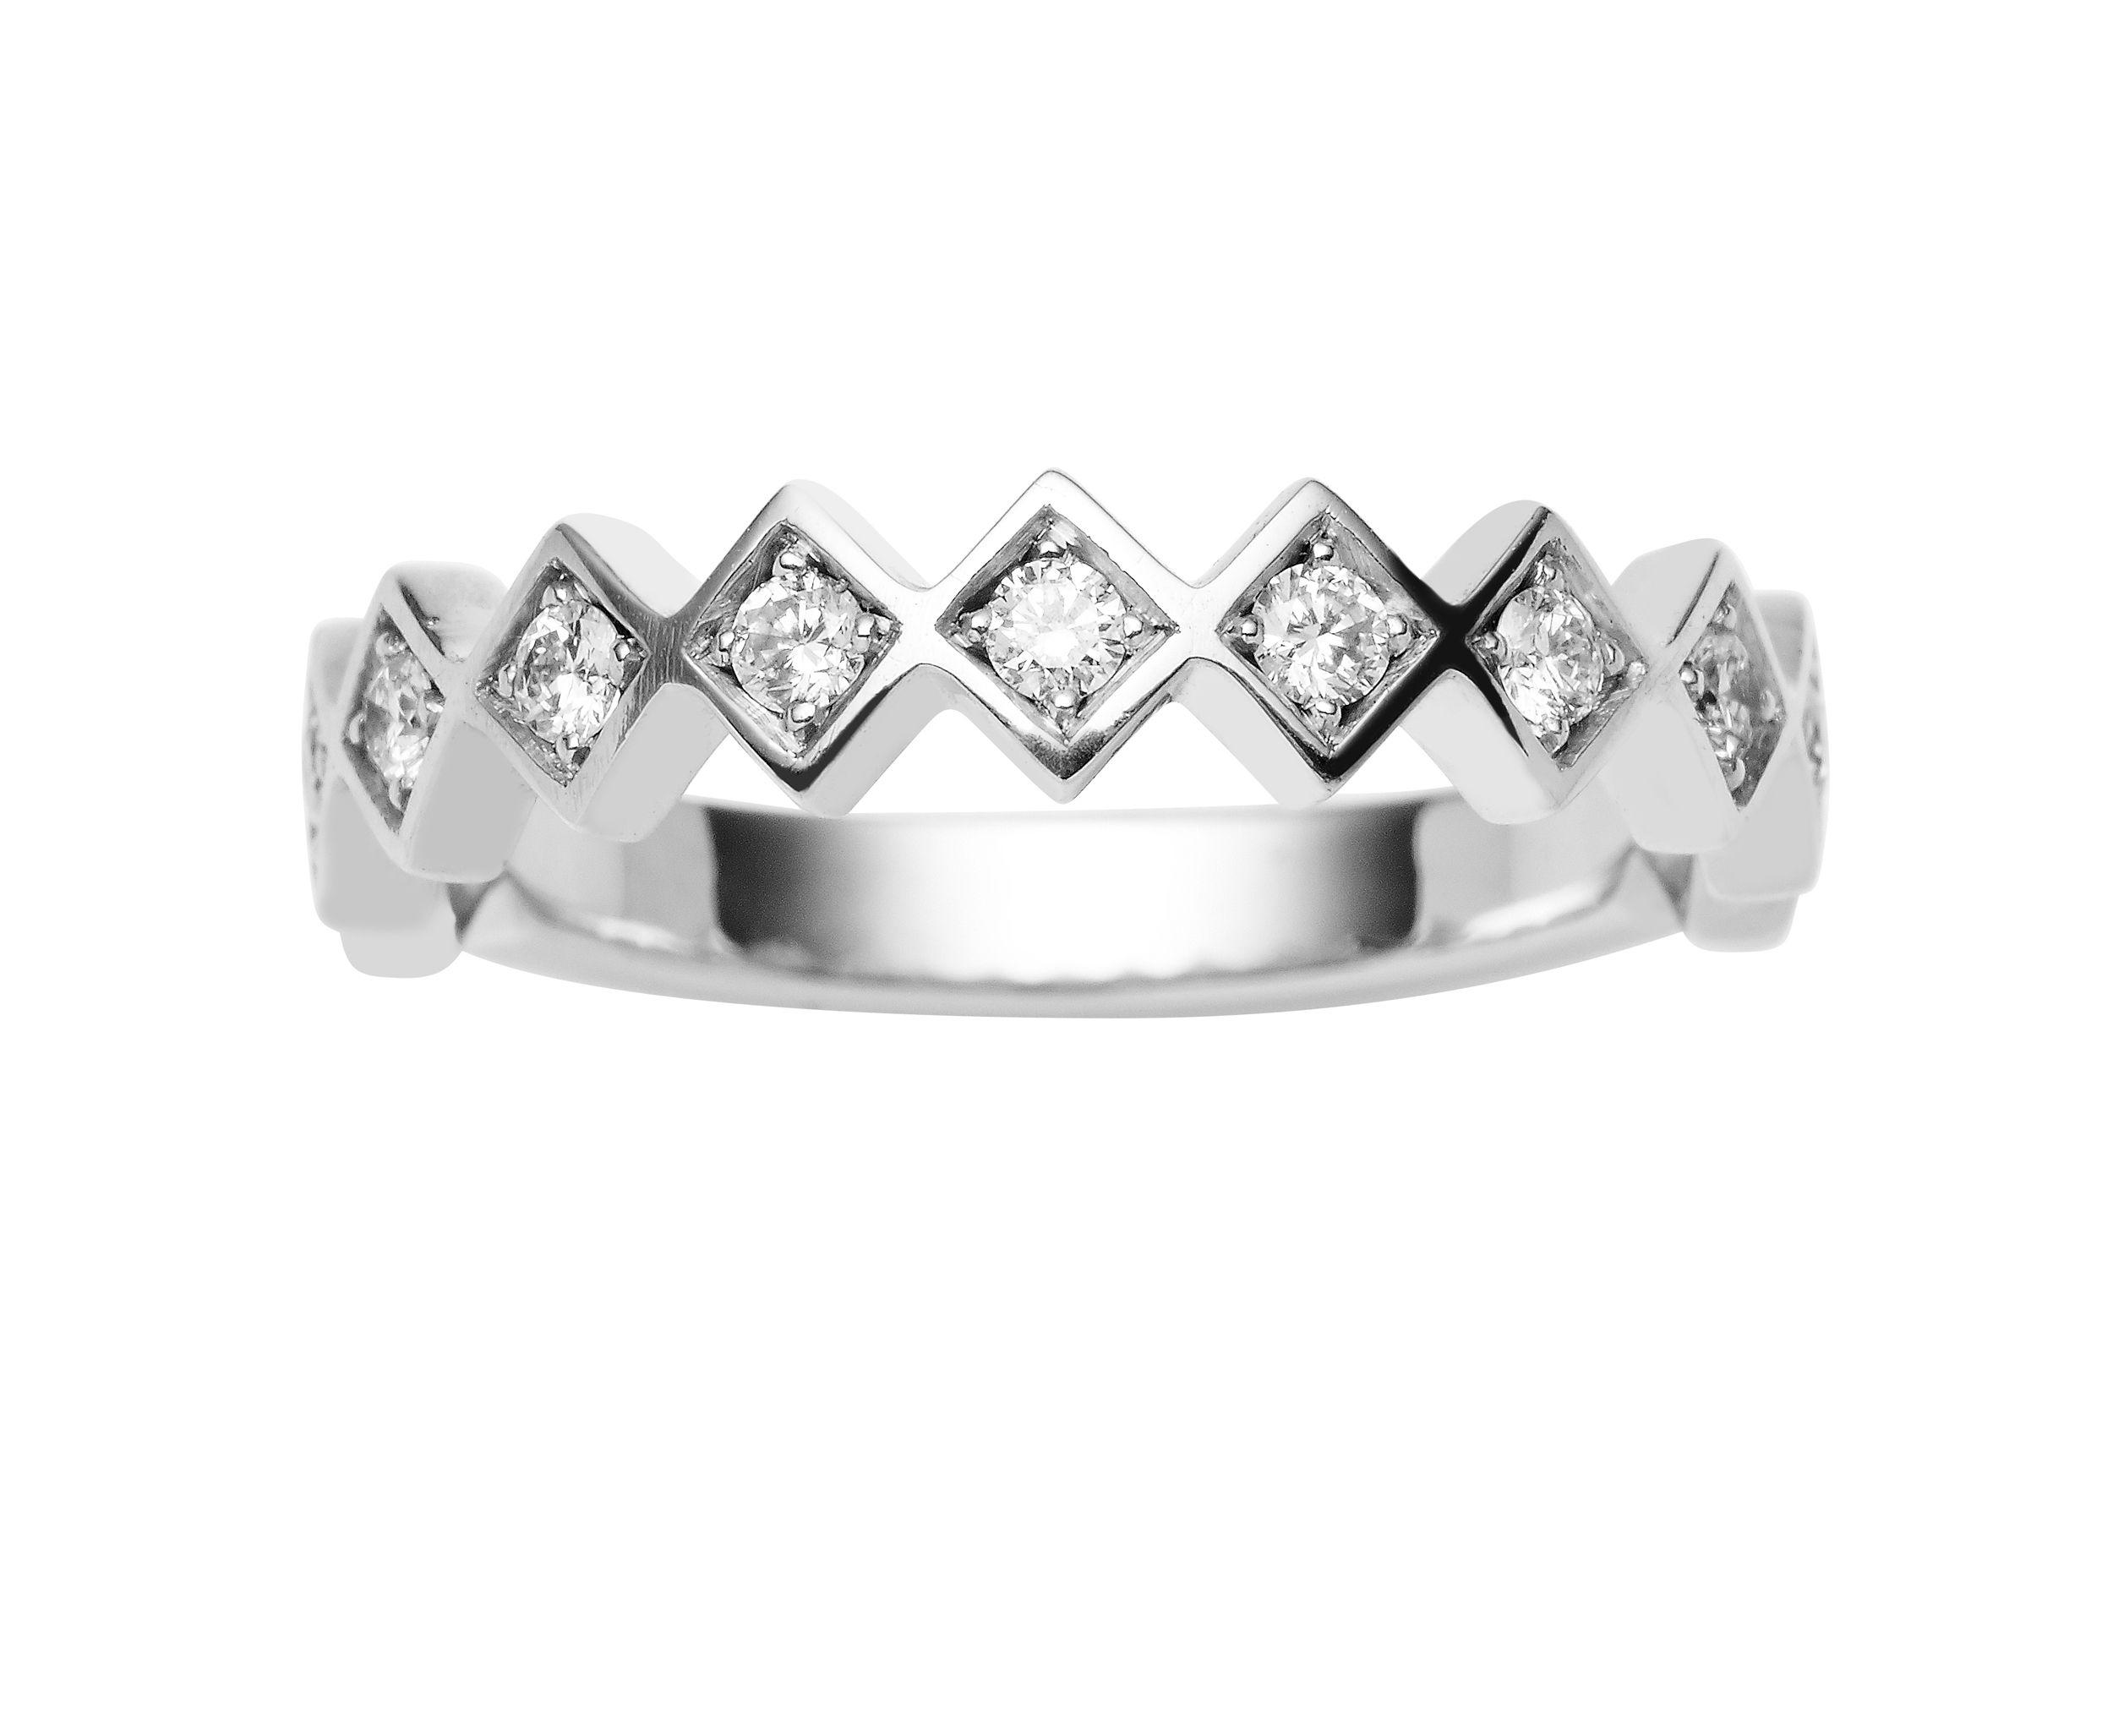 18CT WHITE GOLD DIAMOND TRULLI BAND Diamond wedding